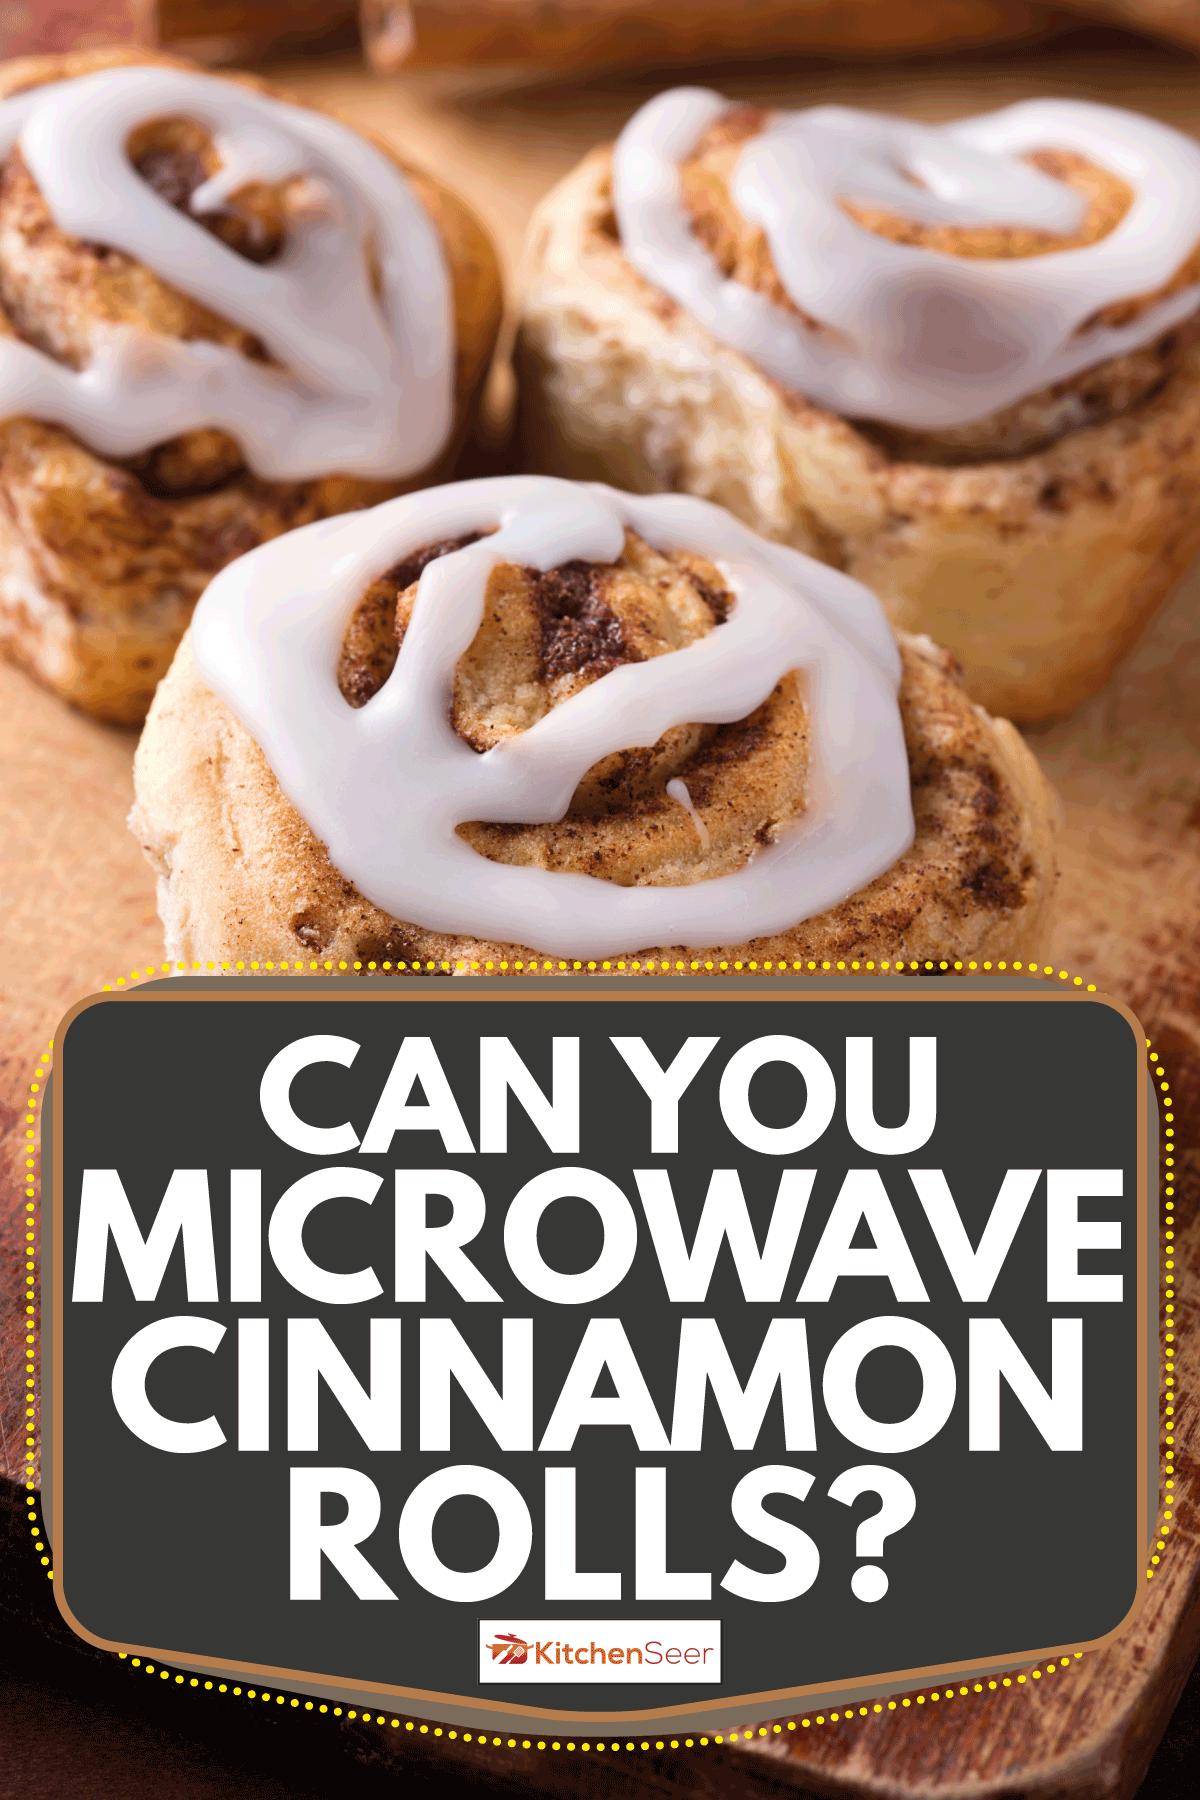 Fresh Cinnamon Buns on a Wooden Cutting Board. Can You Microwave Cinnamon Rolls